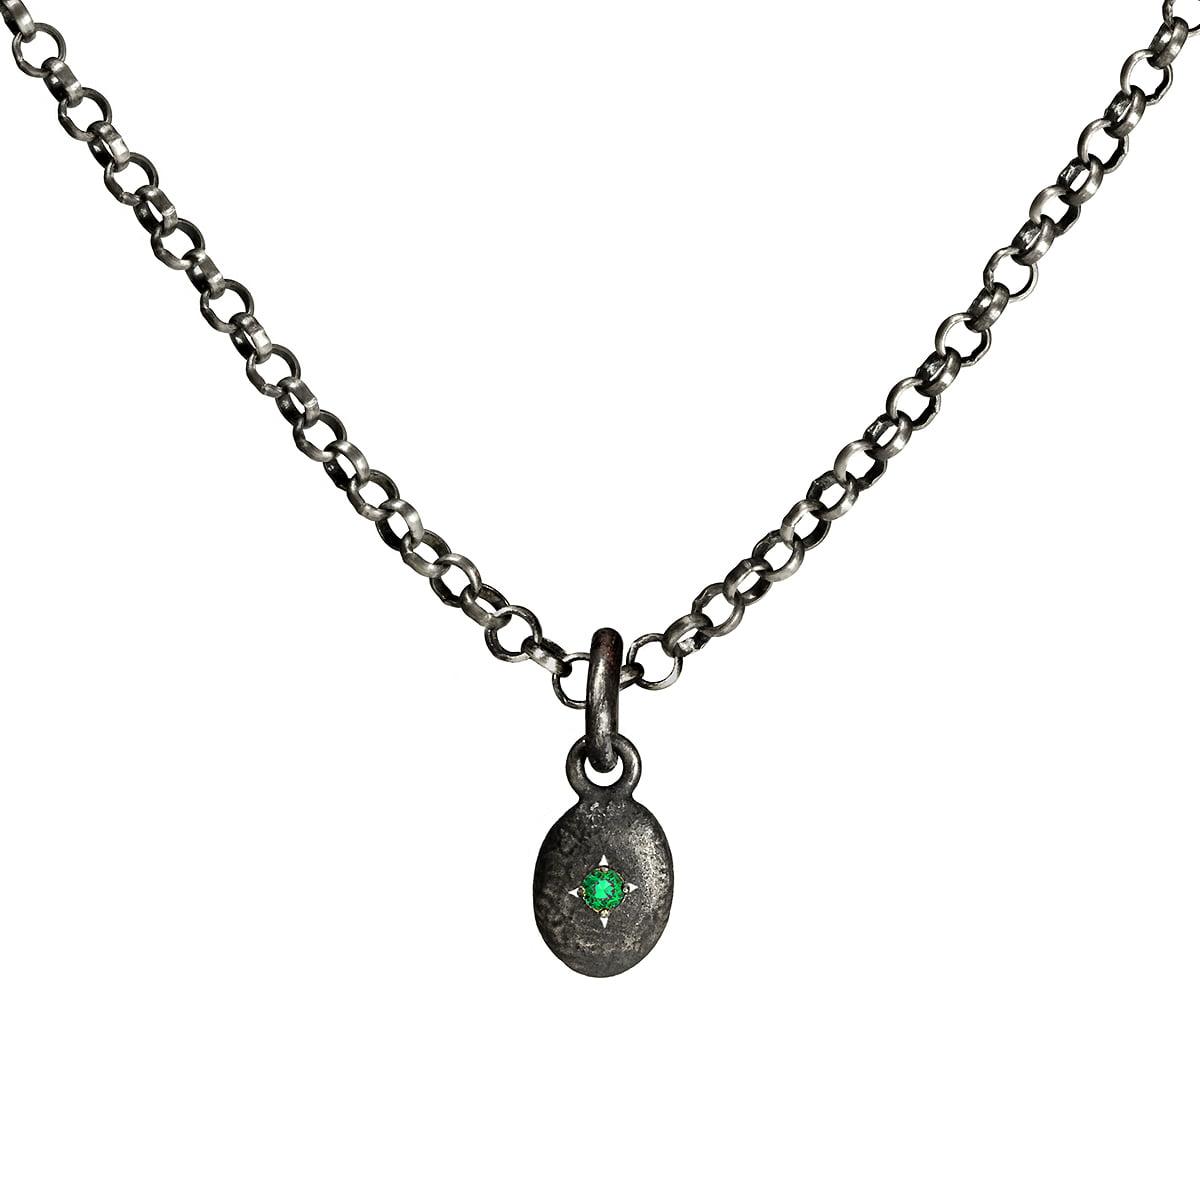 ENVY pendent necklace